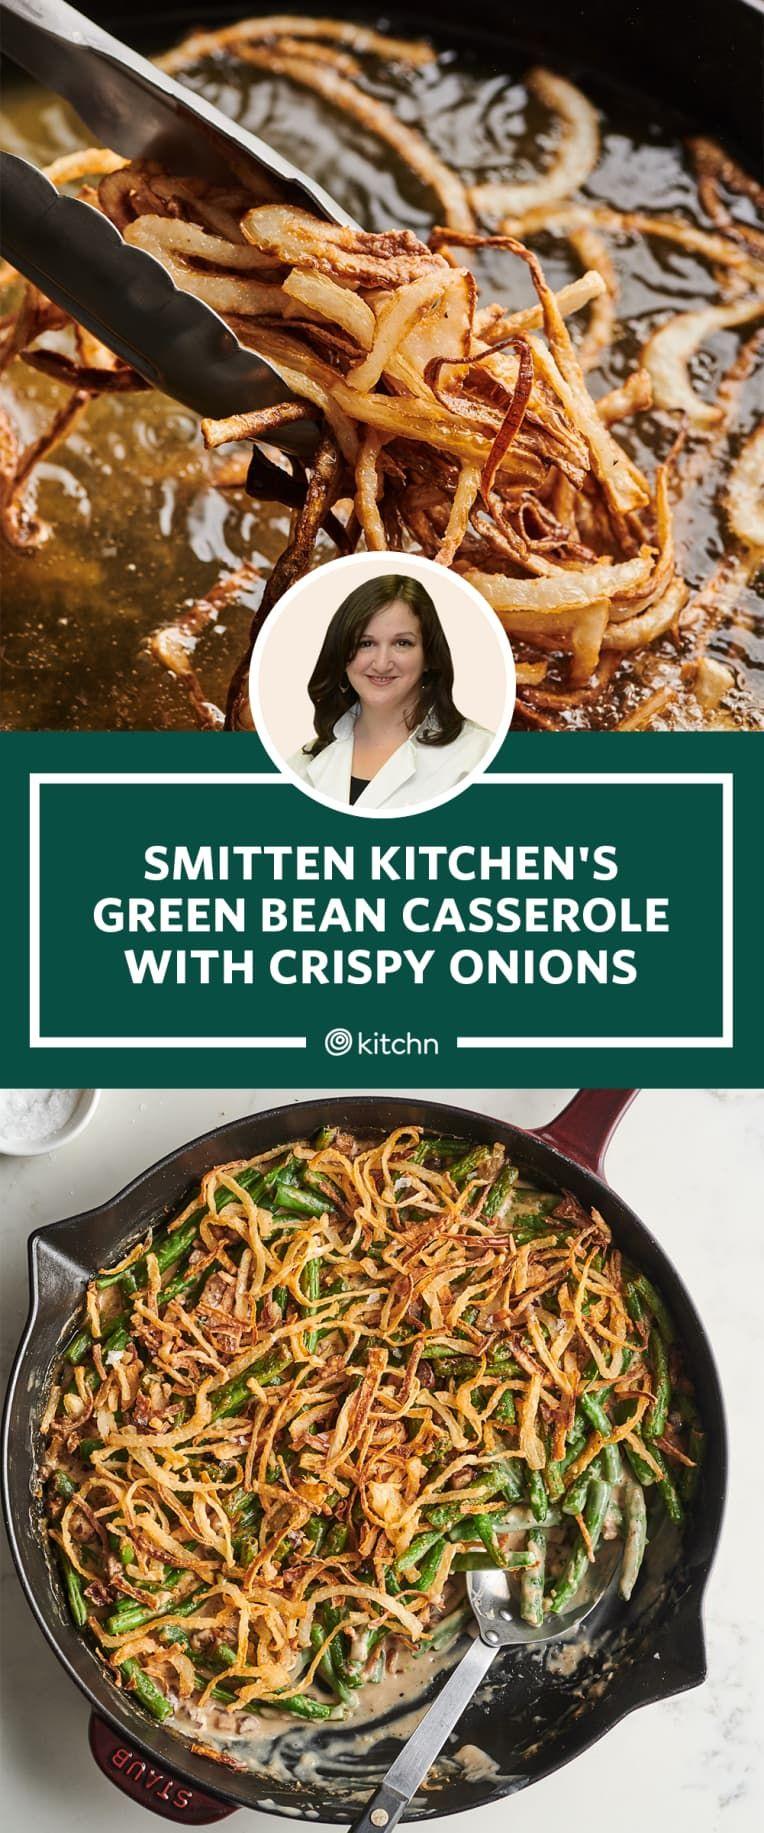 Smitten Kitchen S Green Bean Casserole Is Worth The Extra Step In 2020 Green Bean Casserole Smitten Kitchen Bean Casserole